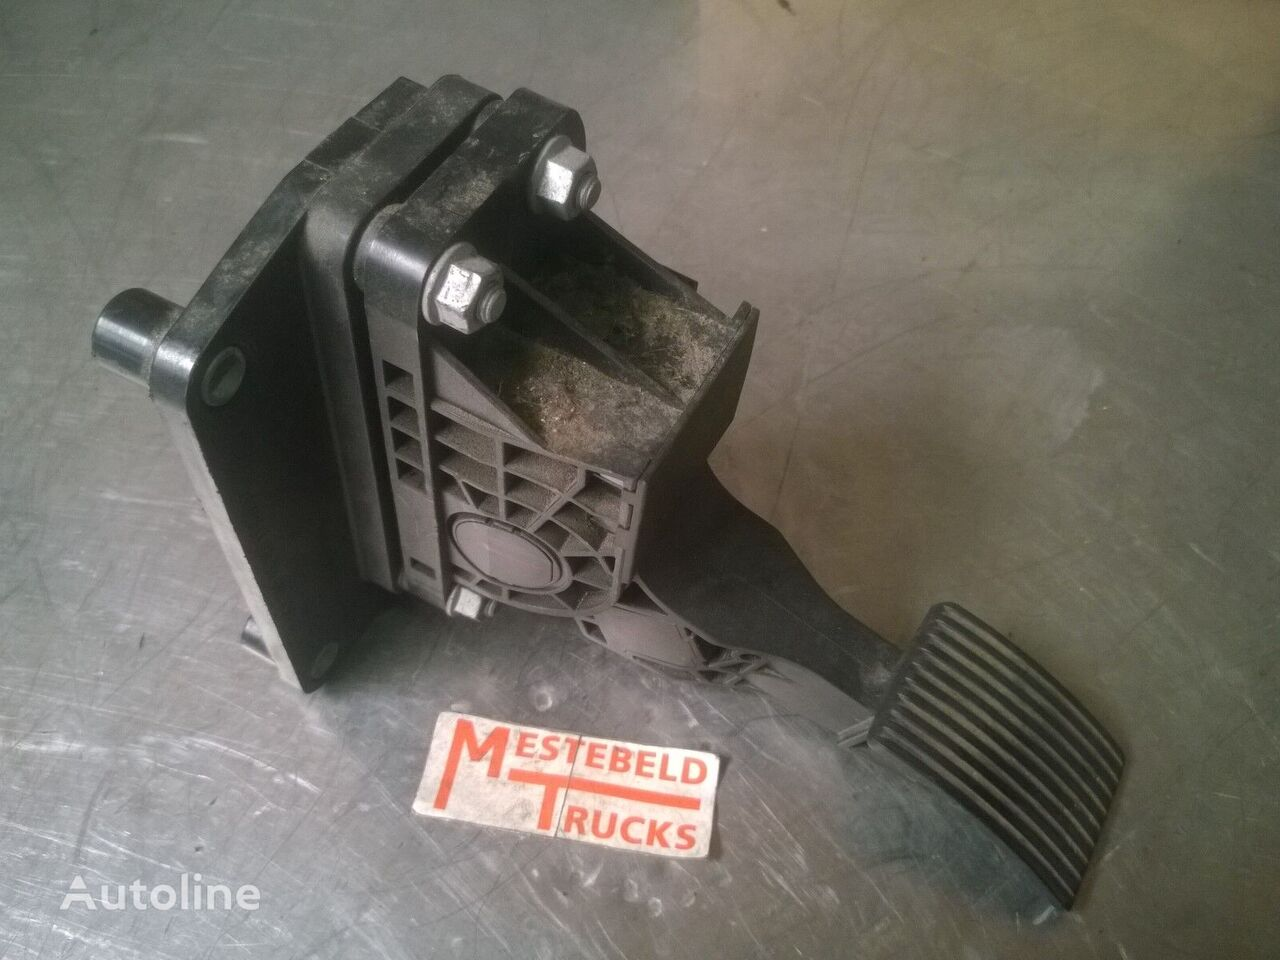 педаль акселератора MERCEDES-BENZ Electronisch gaspedaal (A 940 300 00 04) для грузовика